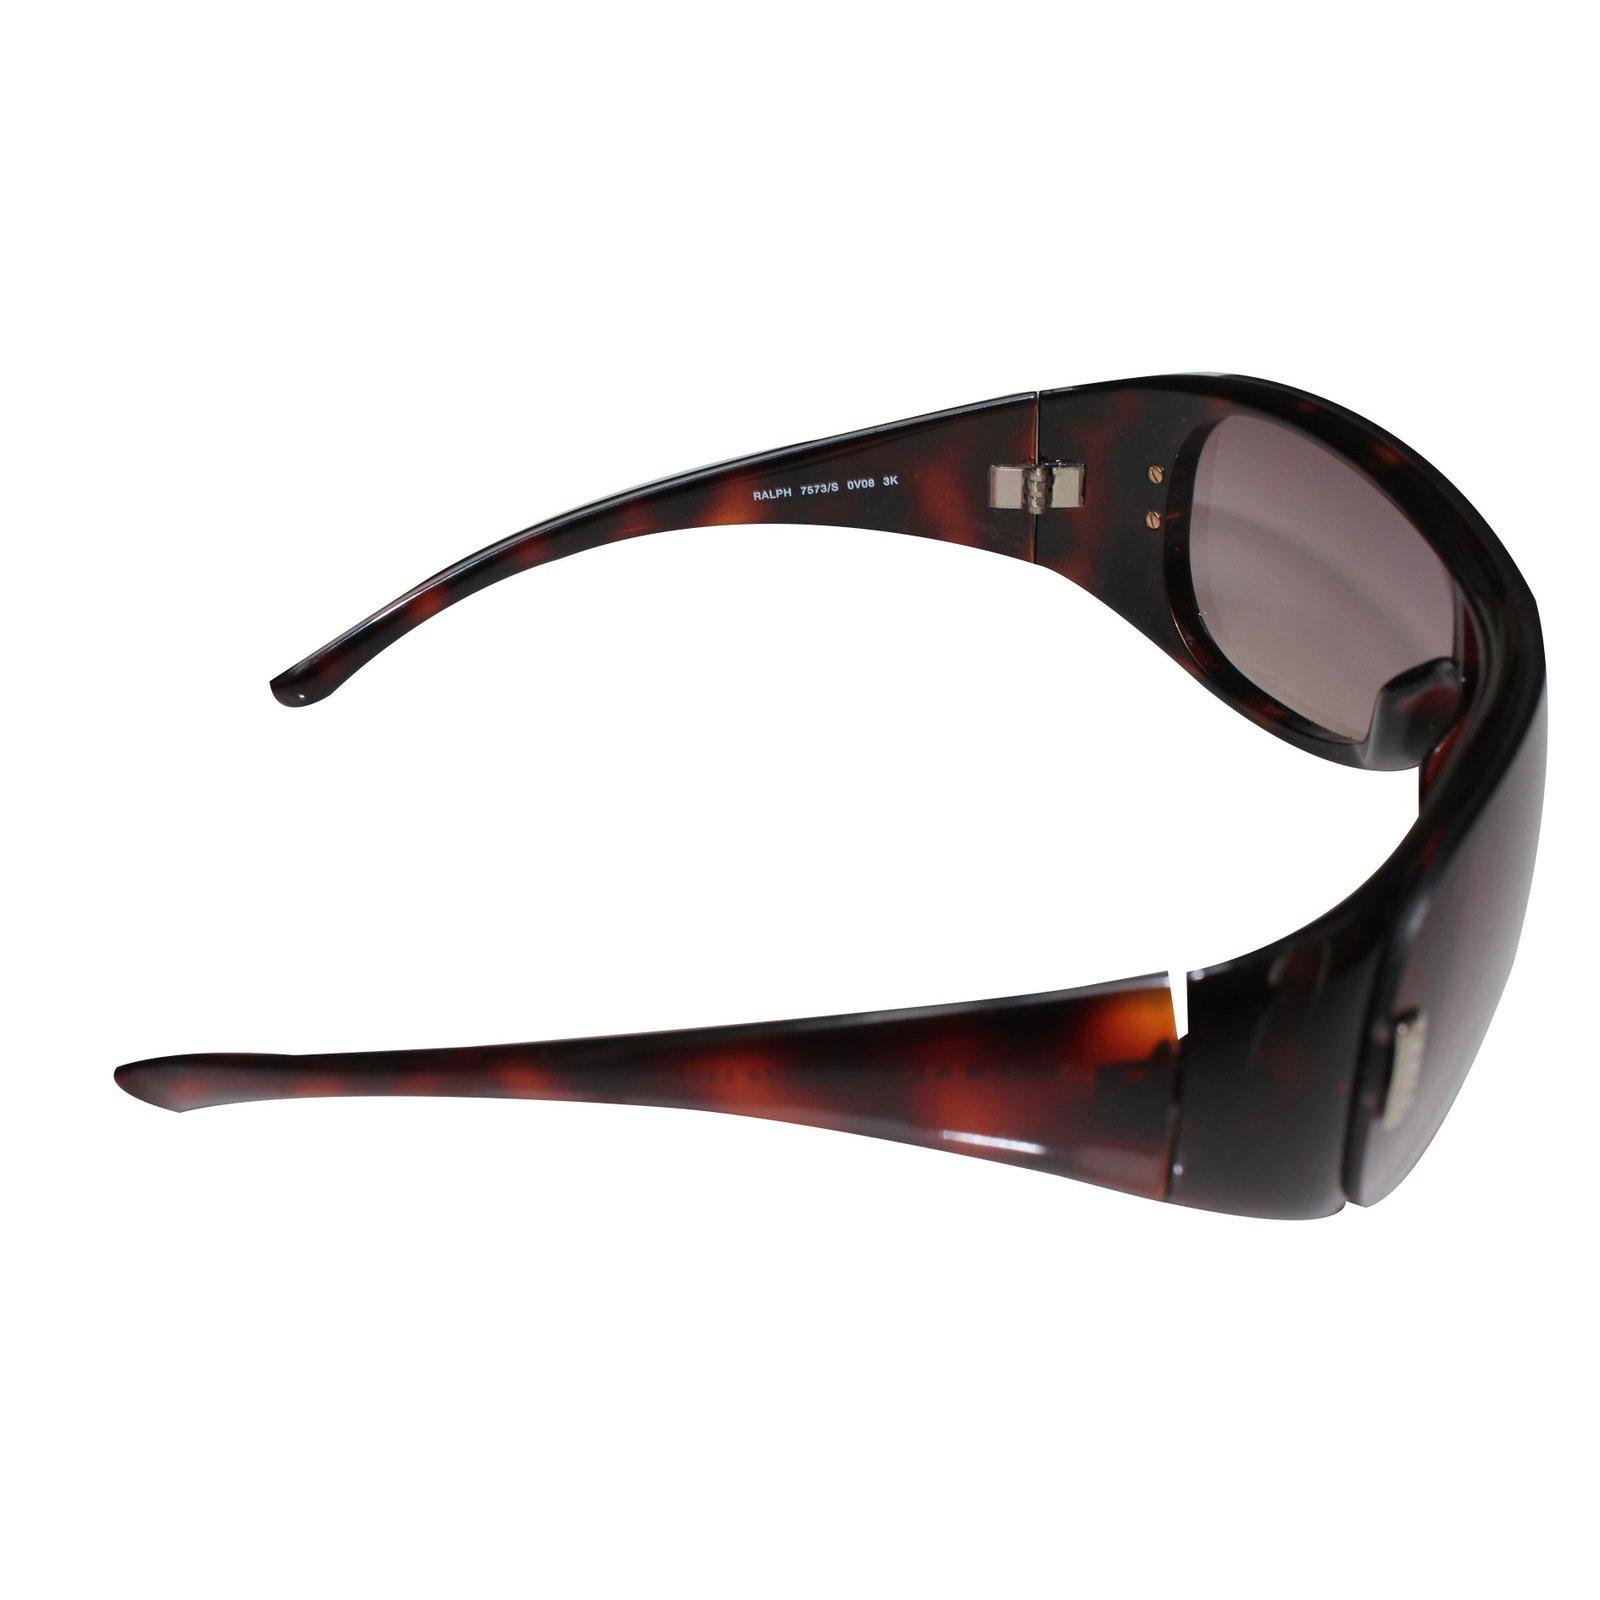 ad812f56ebb Ralph Lauren Sunglasses Sunglasses Other Brown ref.22611 - Joli Closet